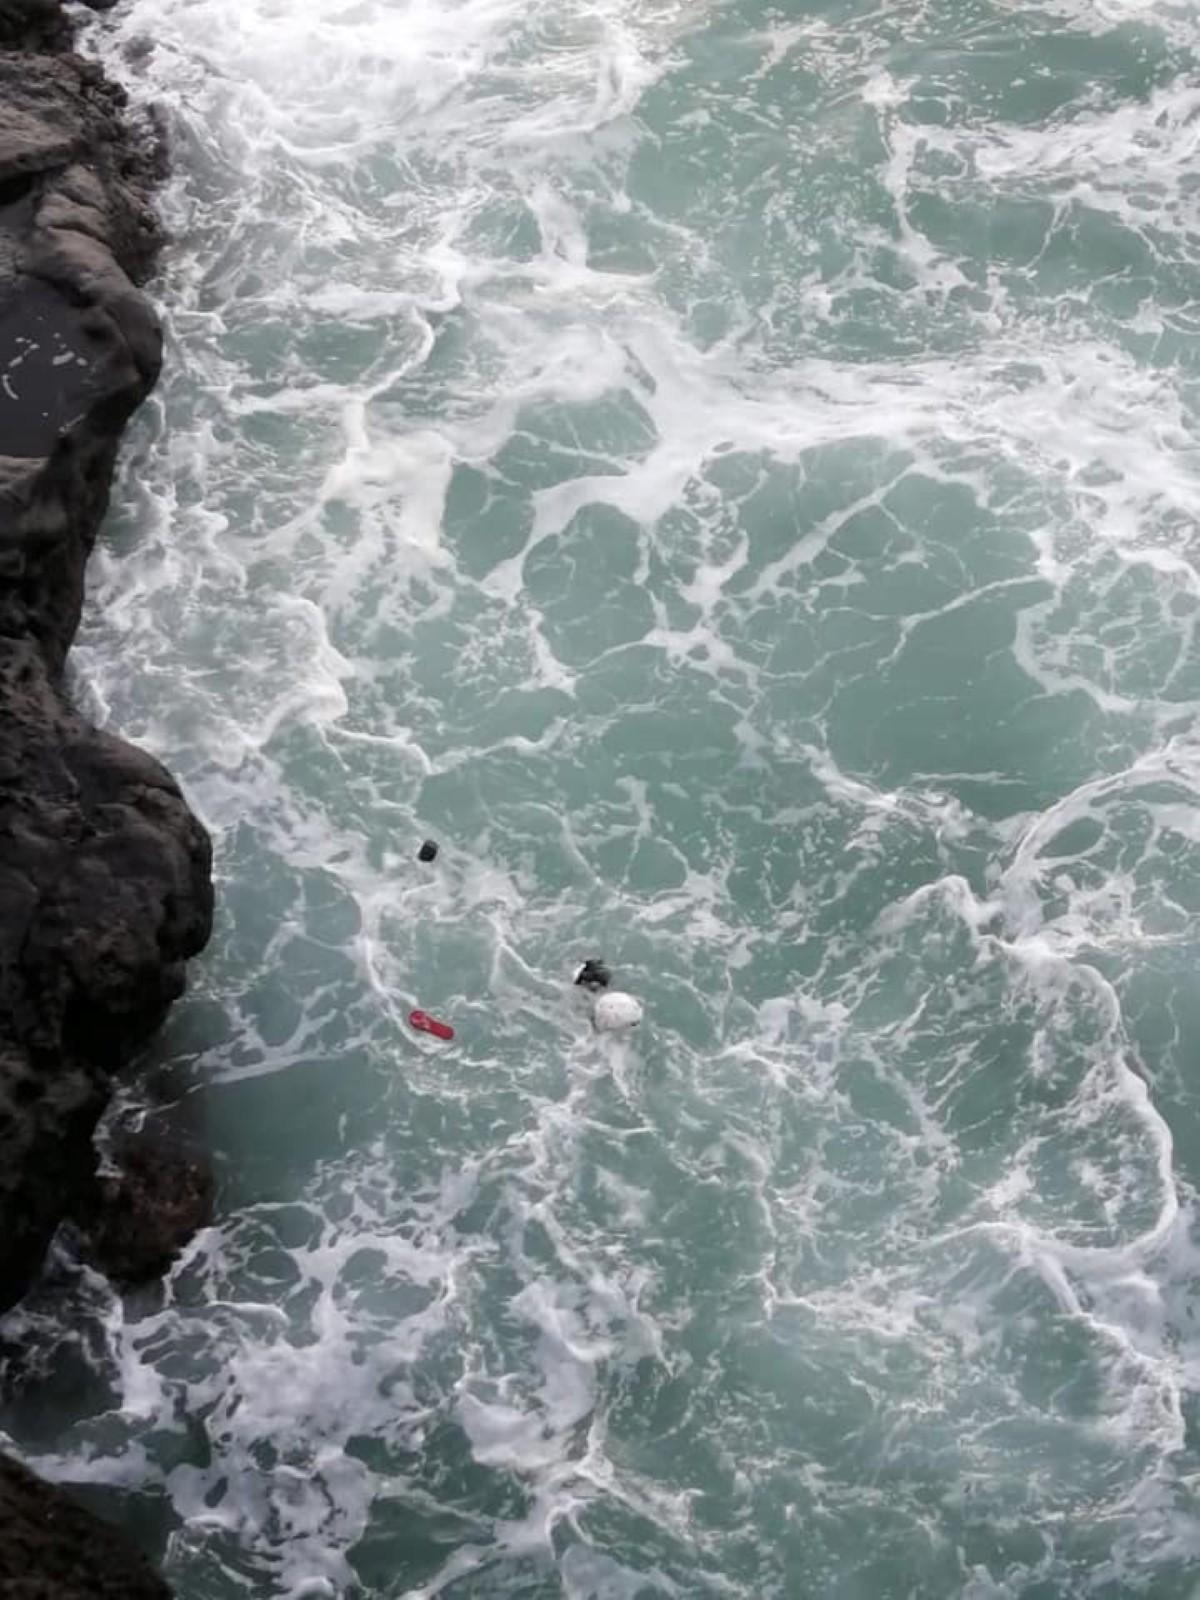 Montagne Zako : Un adolescent de 17 ans disparaît en mer